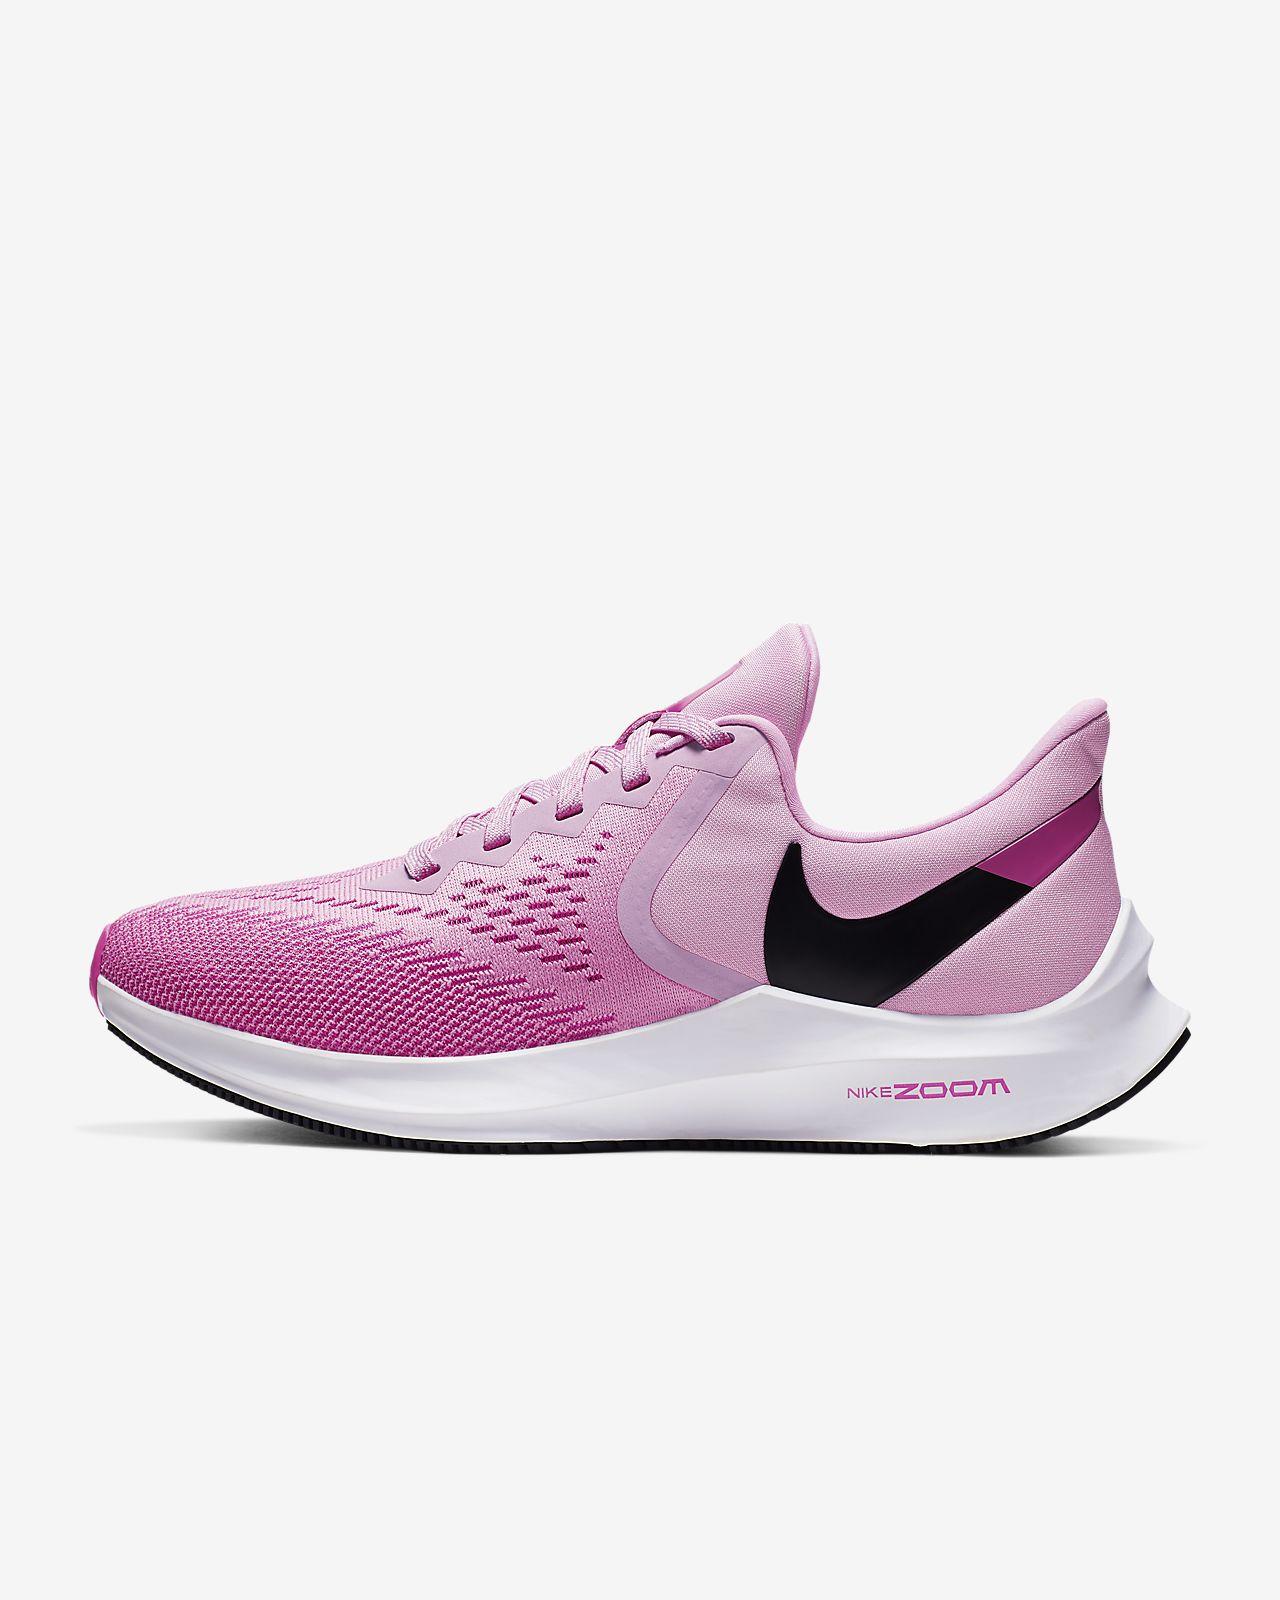 Nike Air Zoom Winflo 6 (Wide) Women's Running Shoe